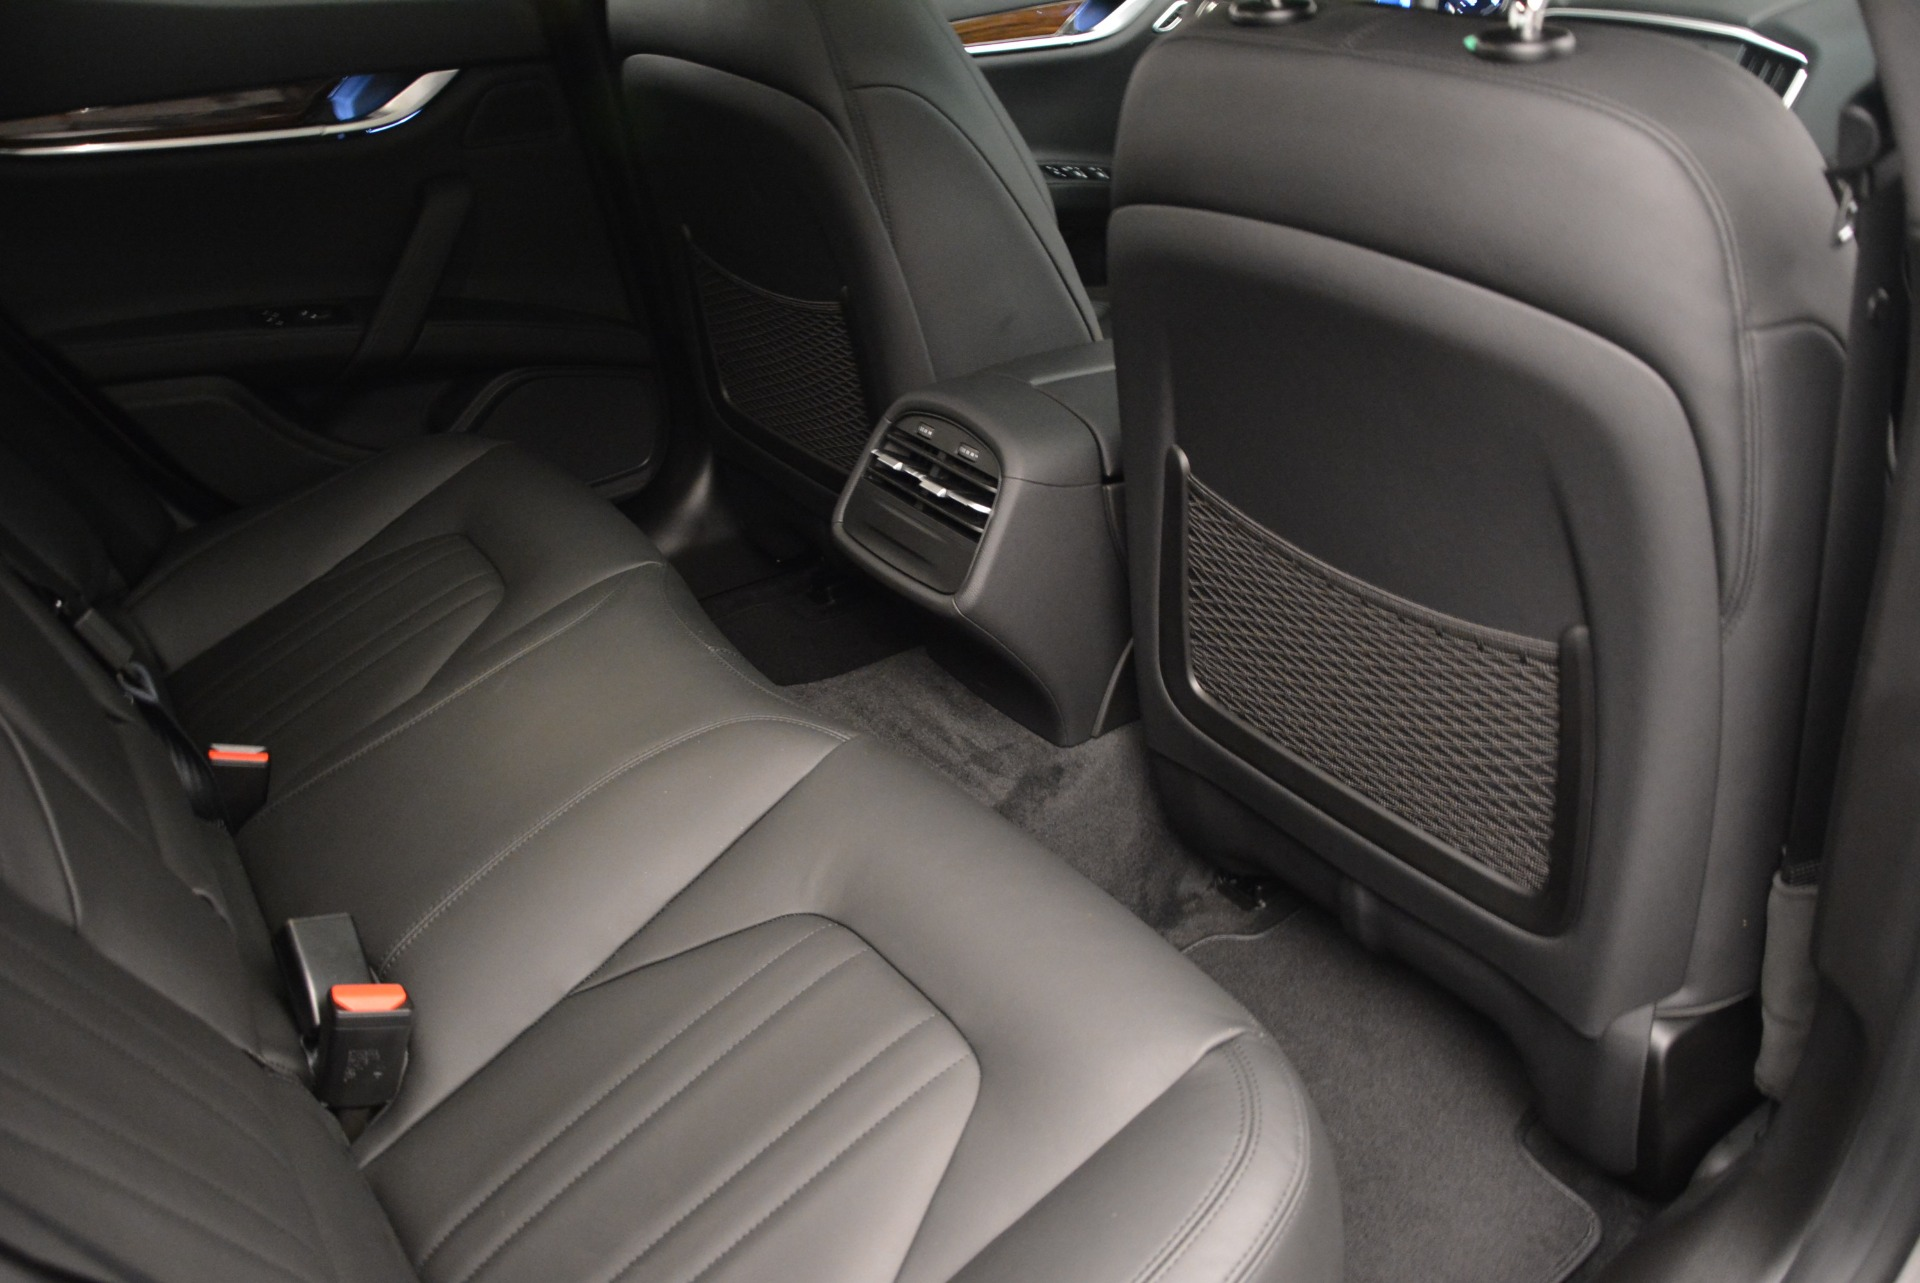 Used 2014 Maserati Ghibli S Q4 For Sale In Greenwich, CT 2562_p23